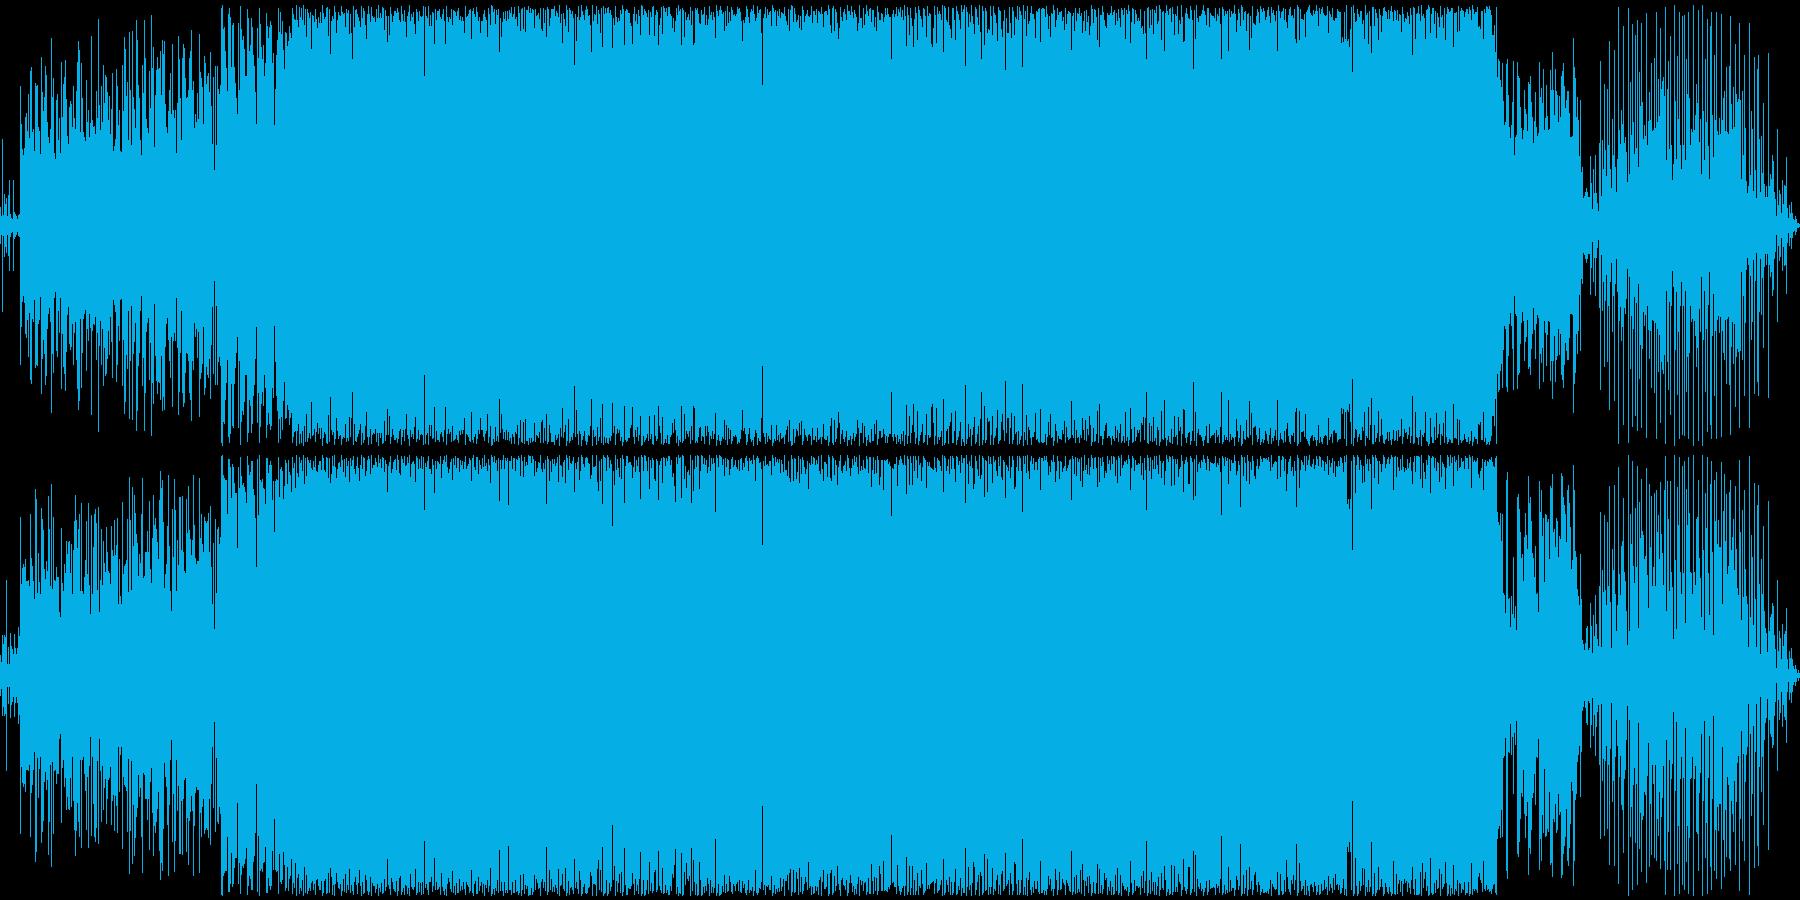 Furious feat. Campanella & KID FRESINOの再生済みの波形